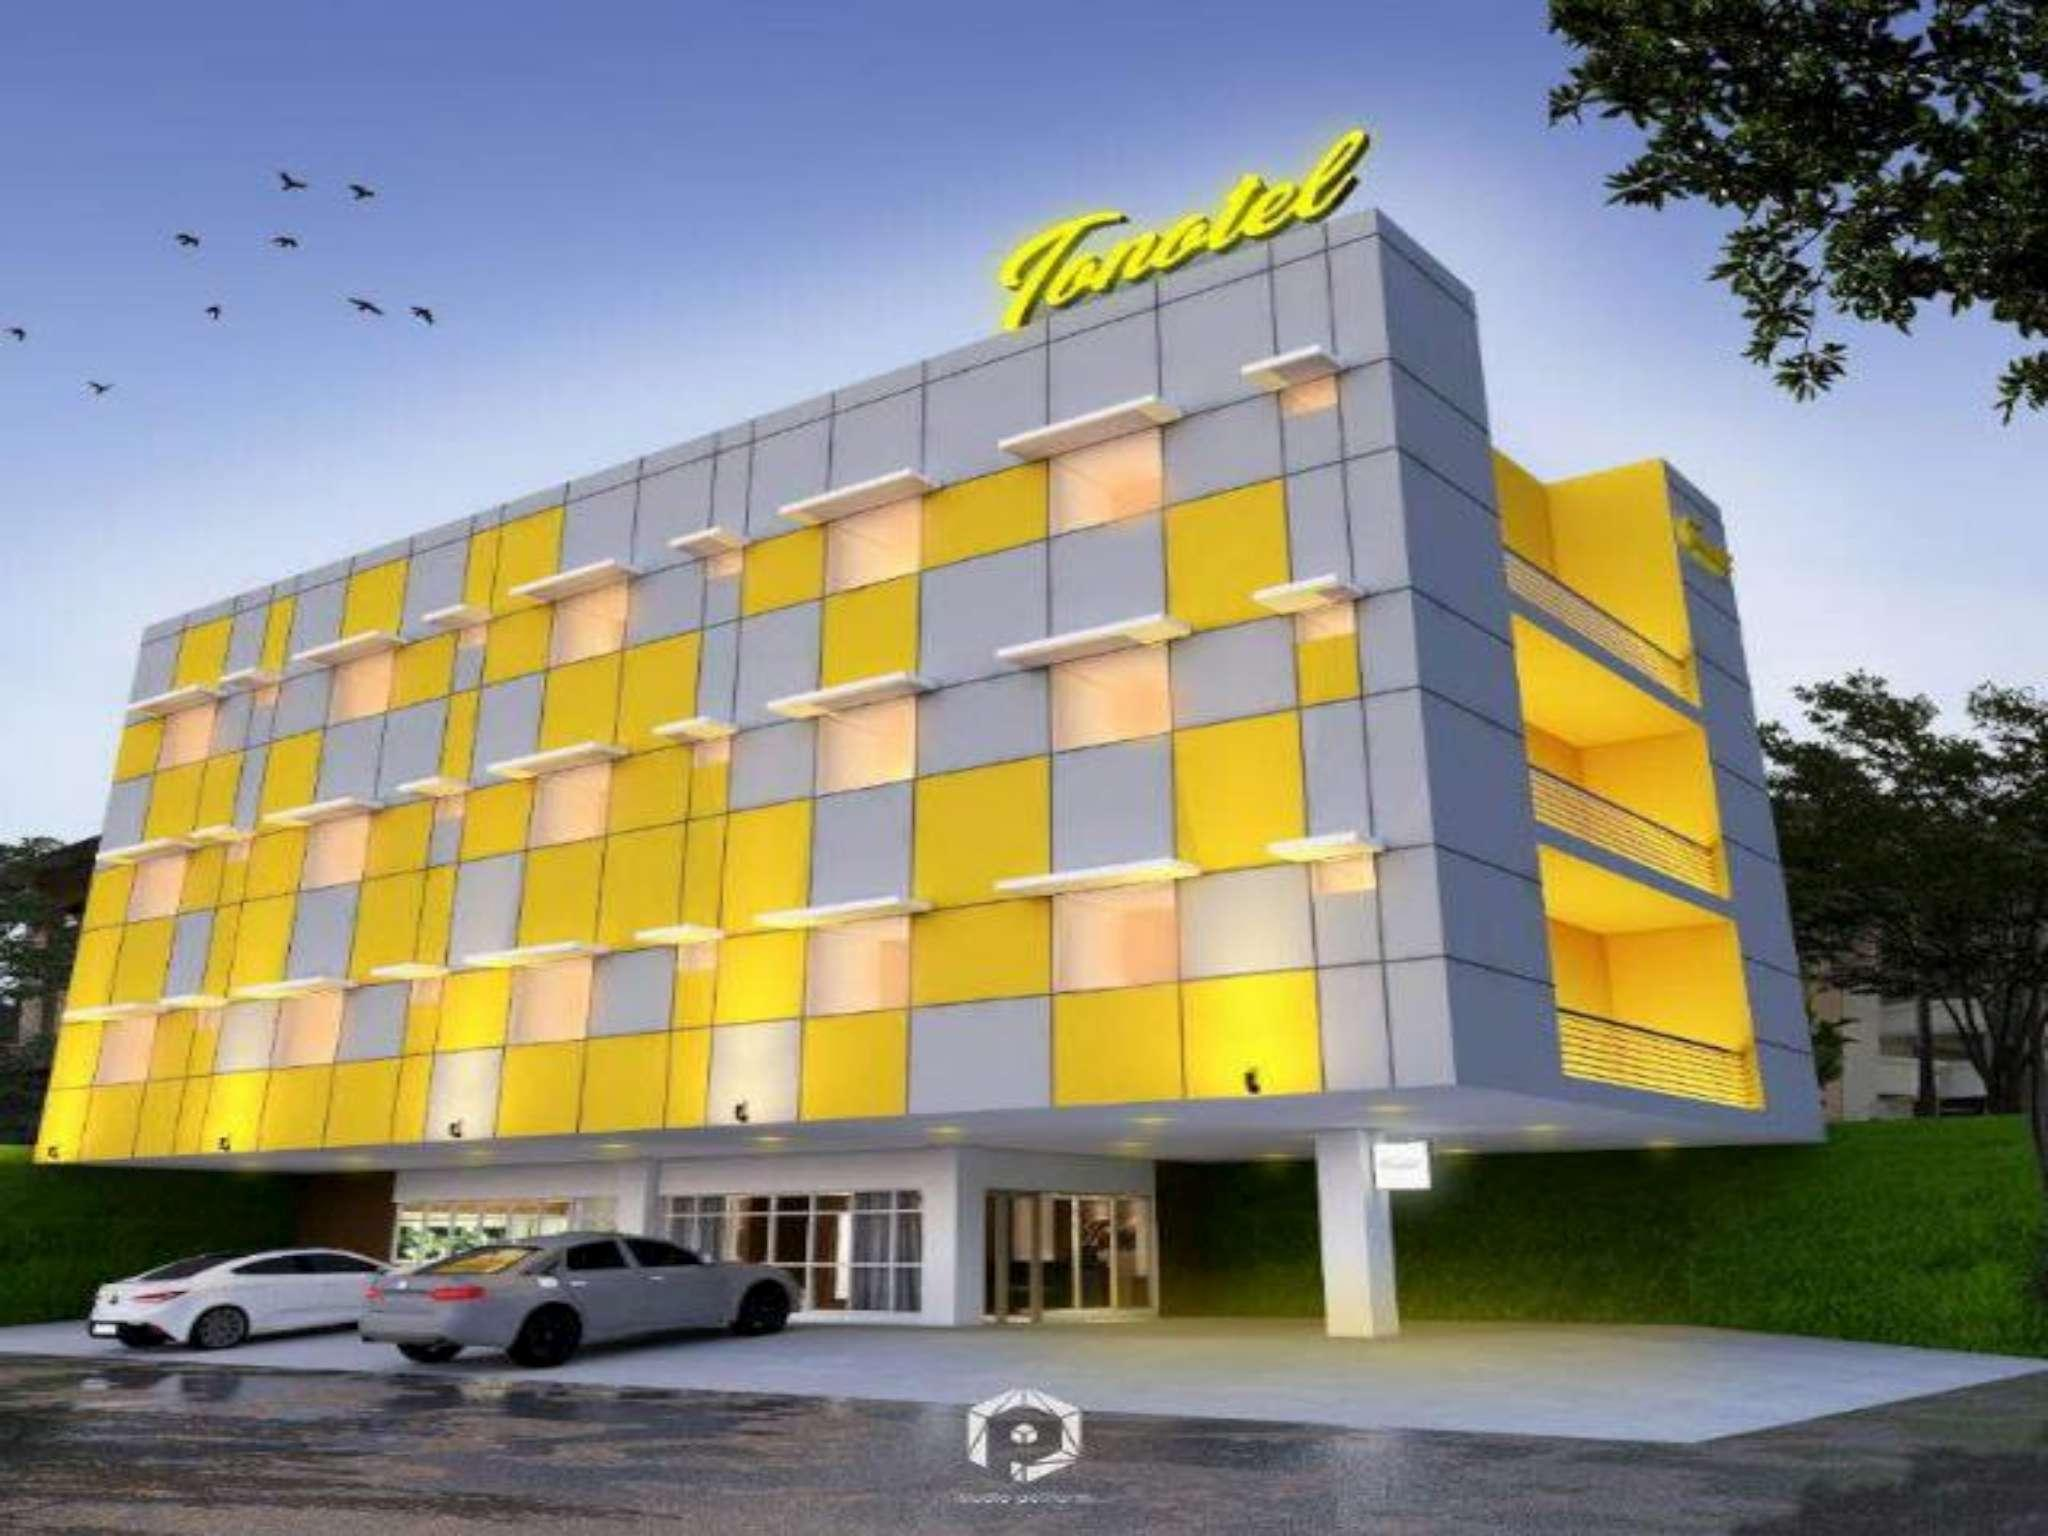 Tonotel Hotel